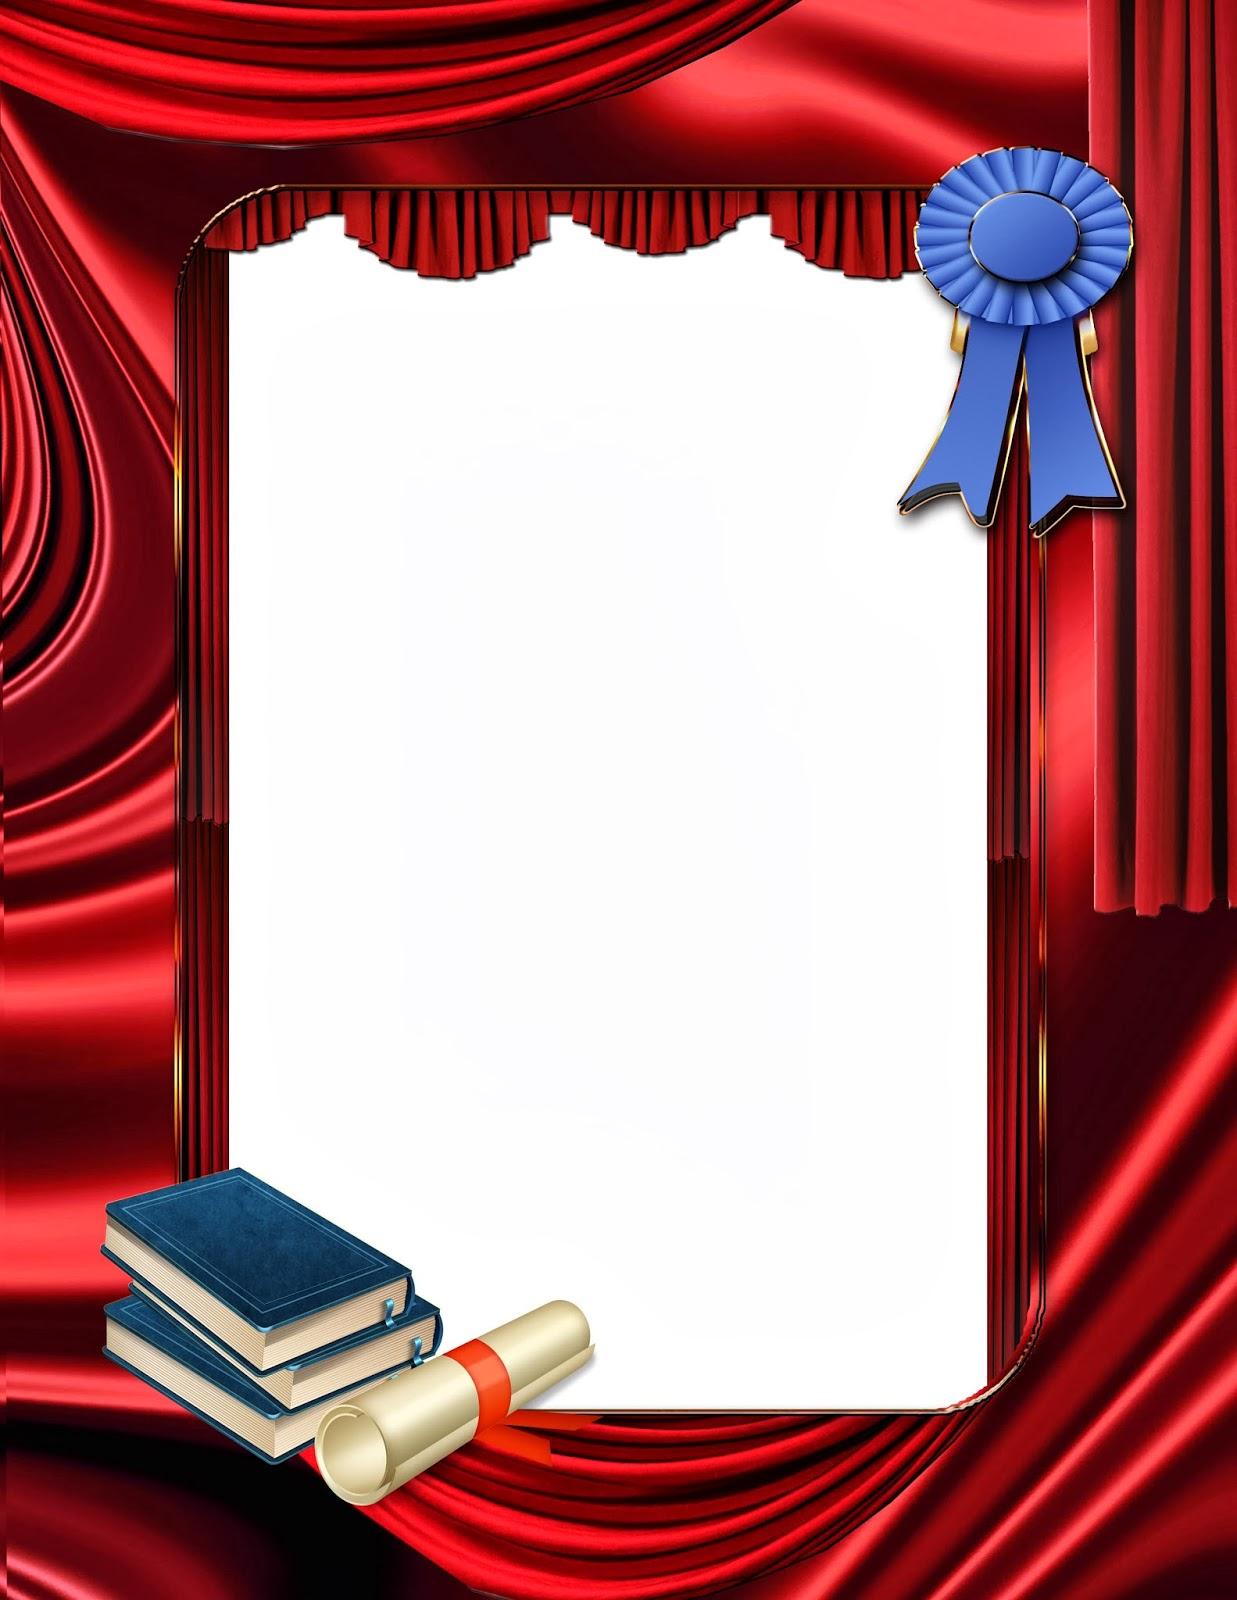 marcos para fotografias de graduacion